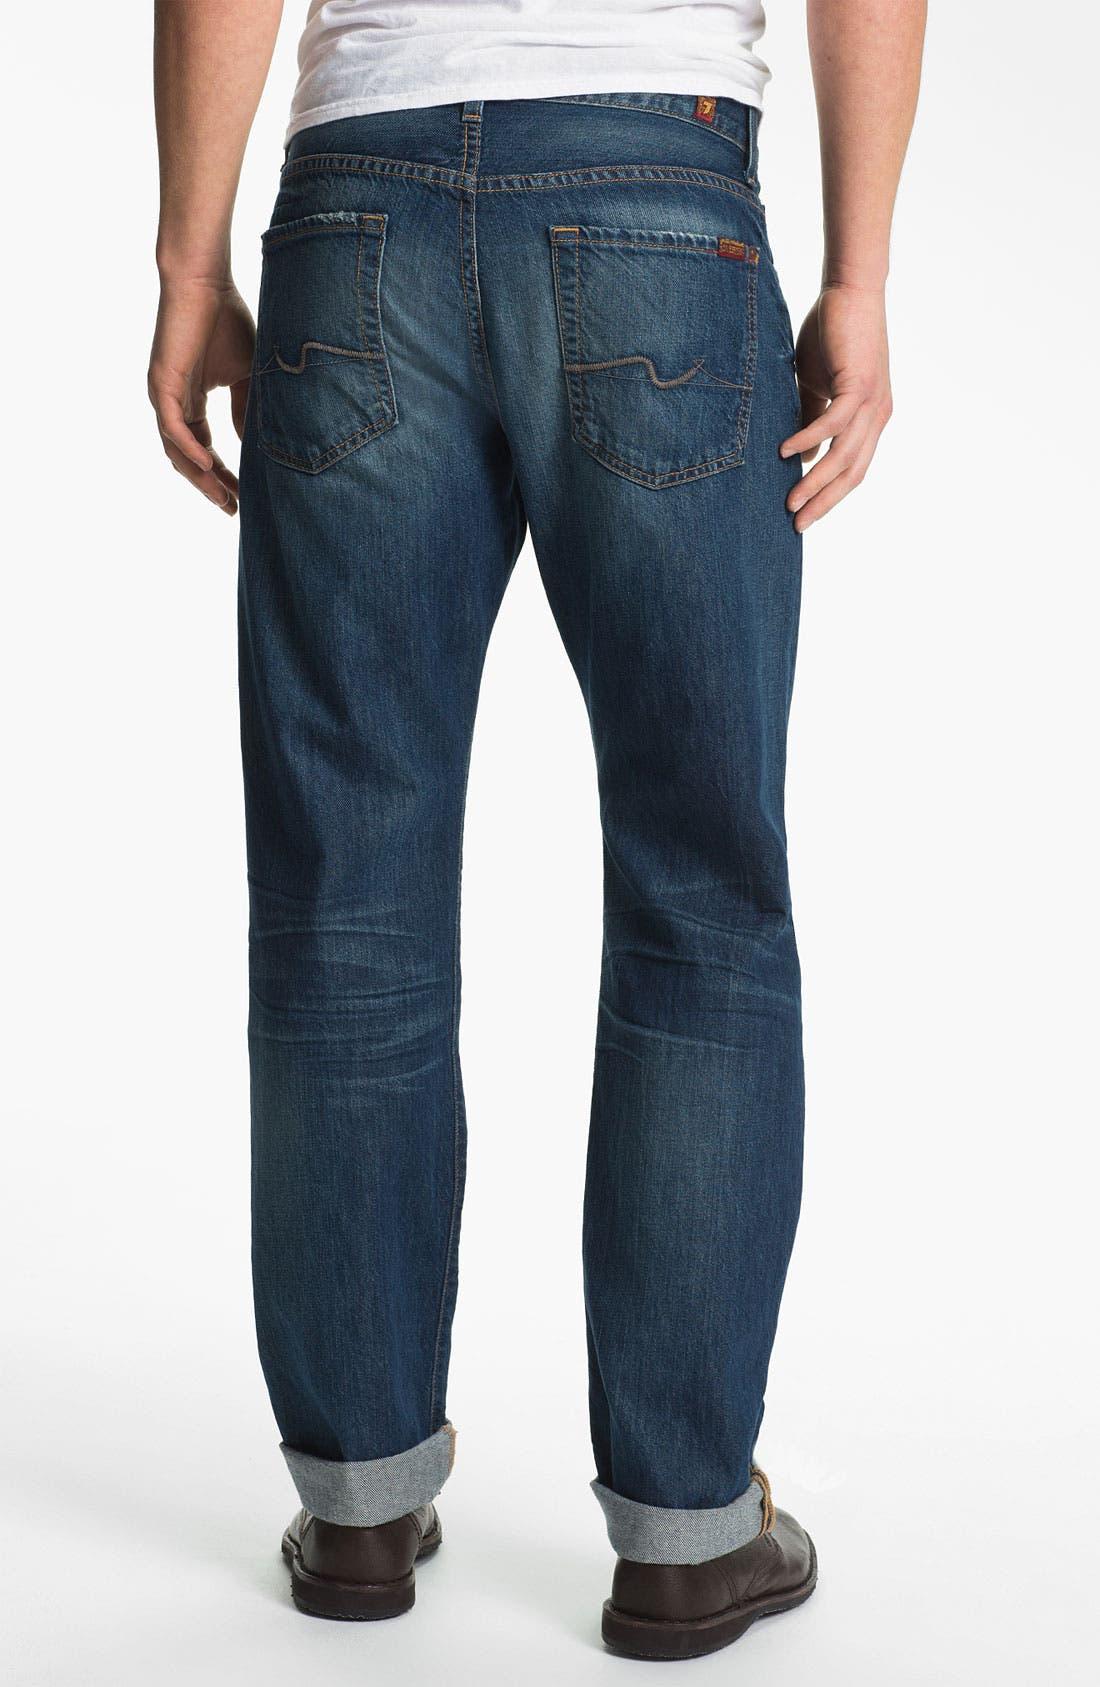 Alternate Image 1 Selected - 7 For All Mankind® 'Carsen' Straight Leg Jeans (Juniper Bay)